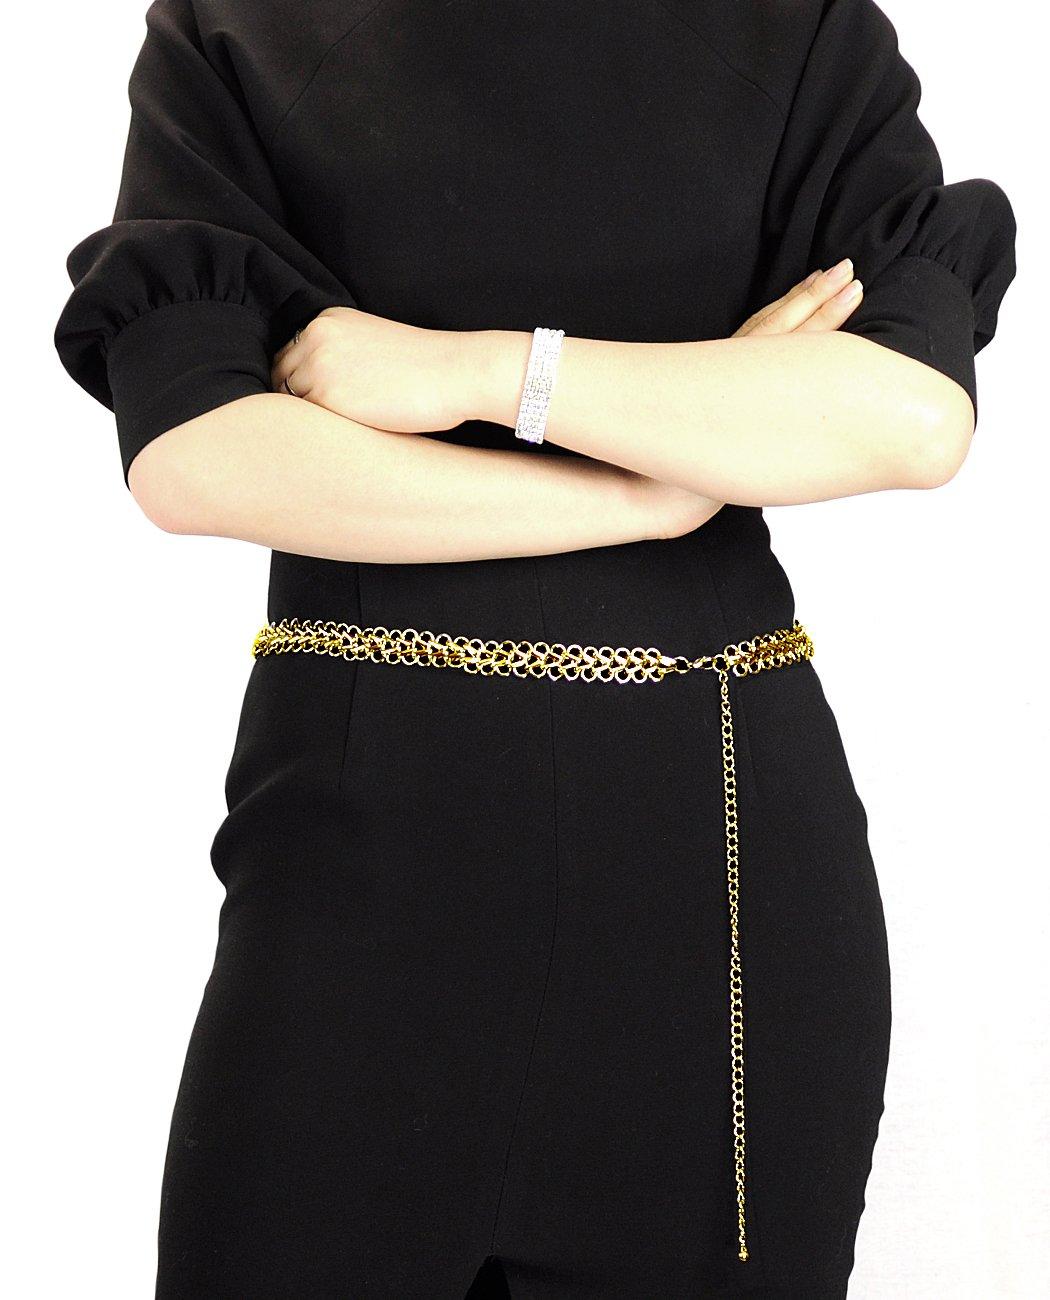 NYfashion101 Fashionable Adjustable Single Link Chain Belly Chain Belt IBT2006G